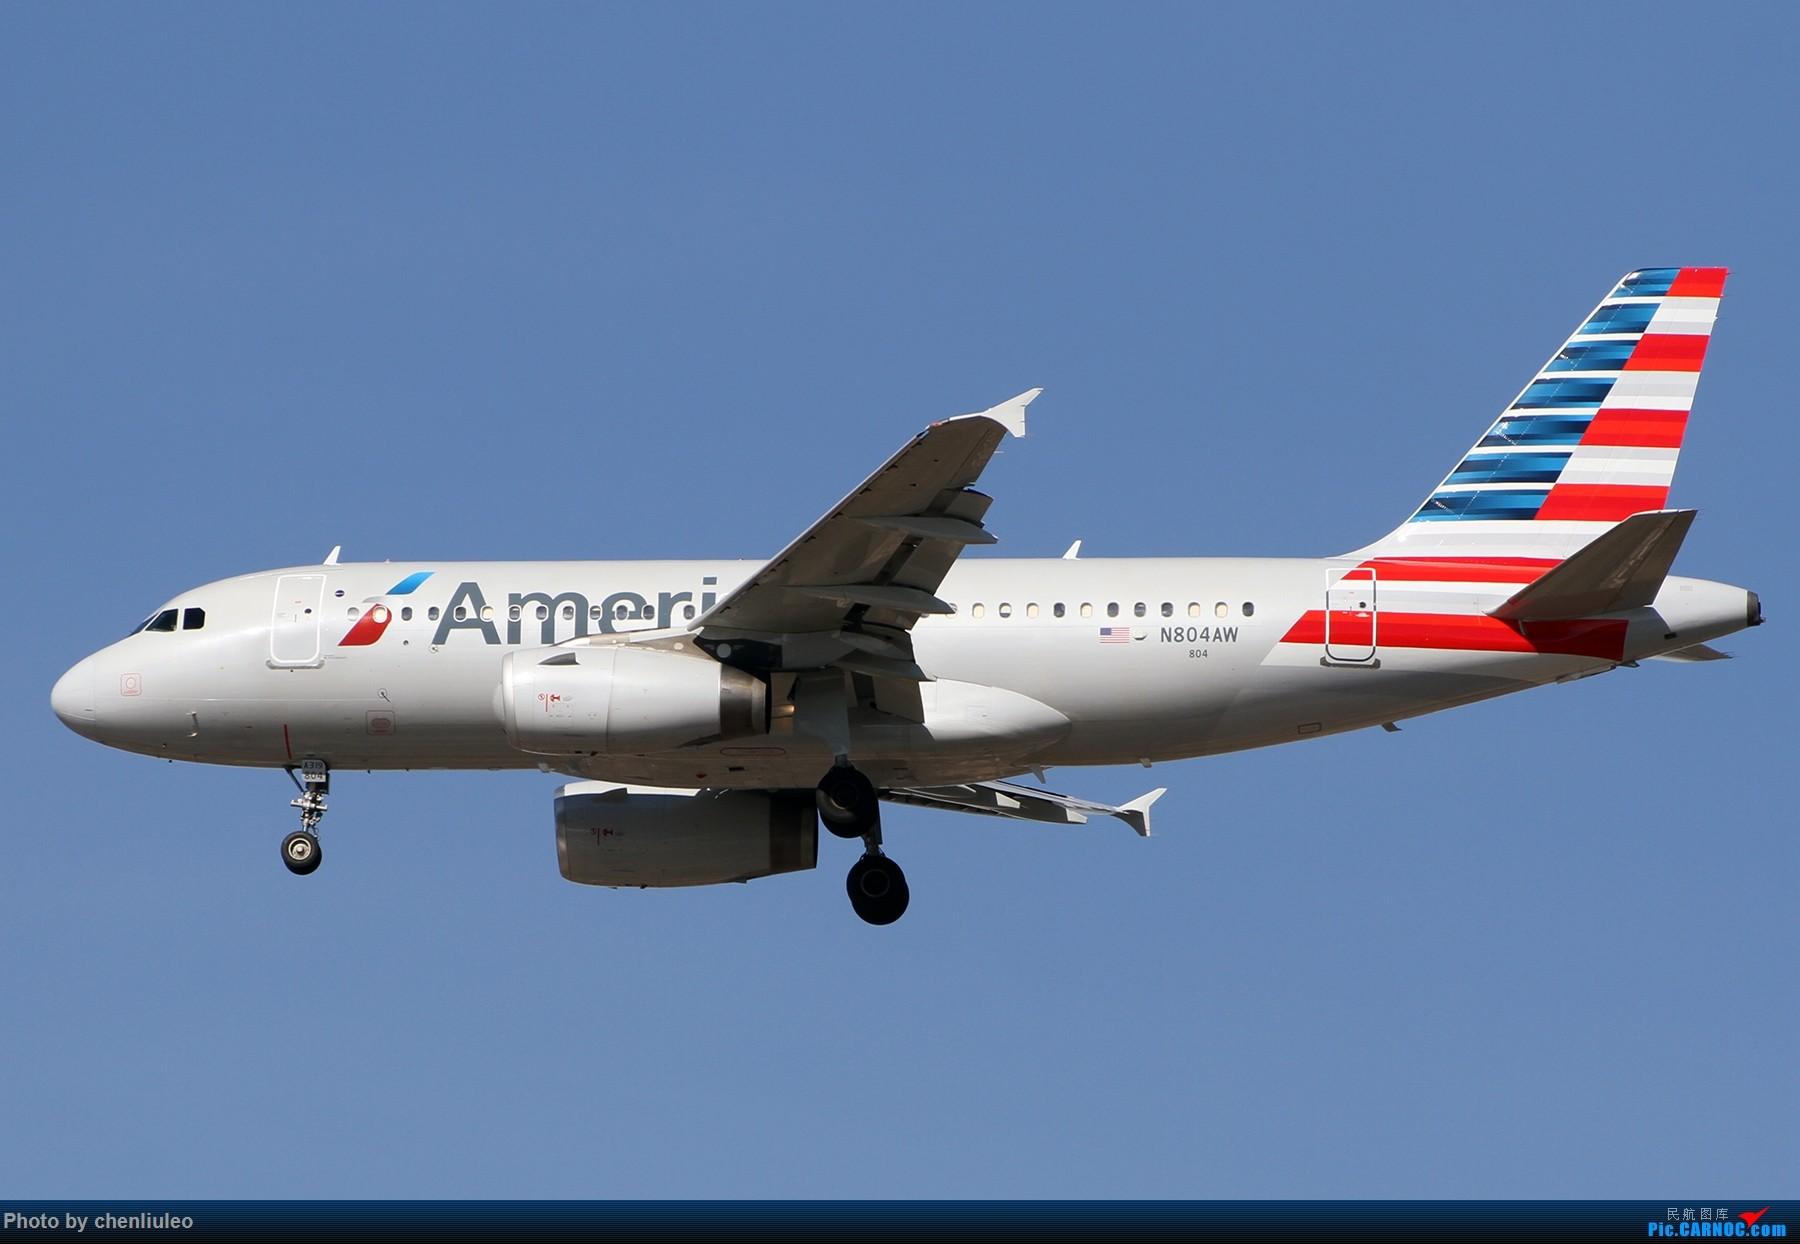 Re:[原创]【杭州飞友会】KSTL拍机。AA WN DL F9 BBJ 1800大图 AIRBUS A319-132 N804AW 美国圣路易斯机场